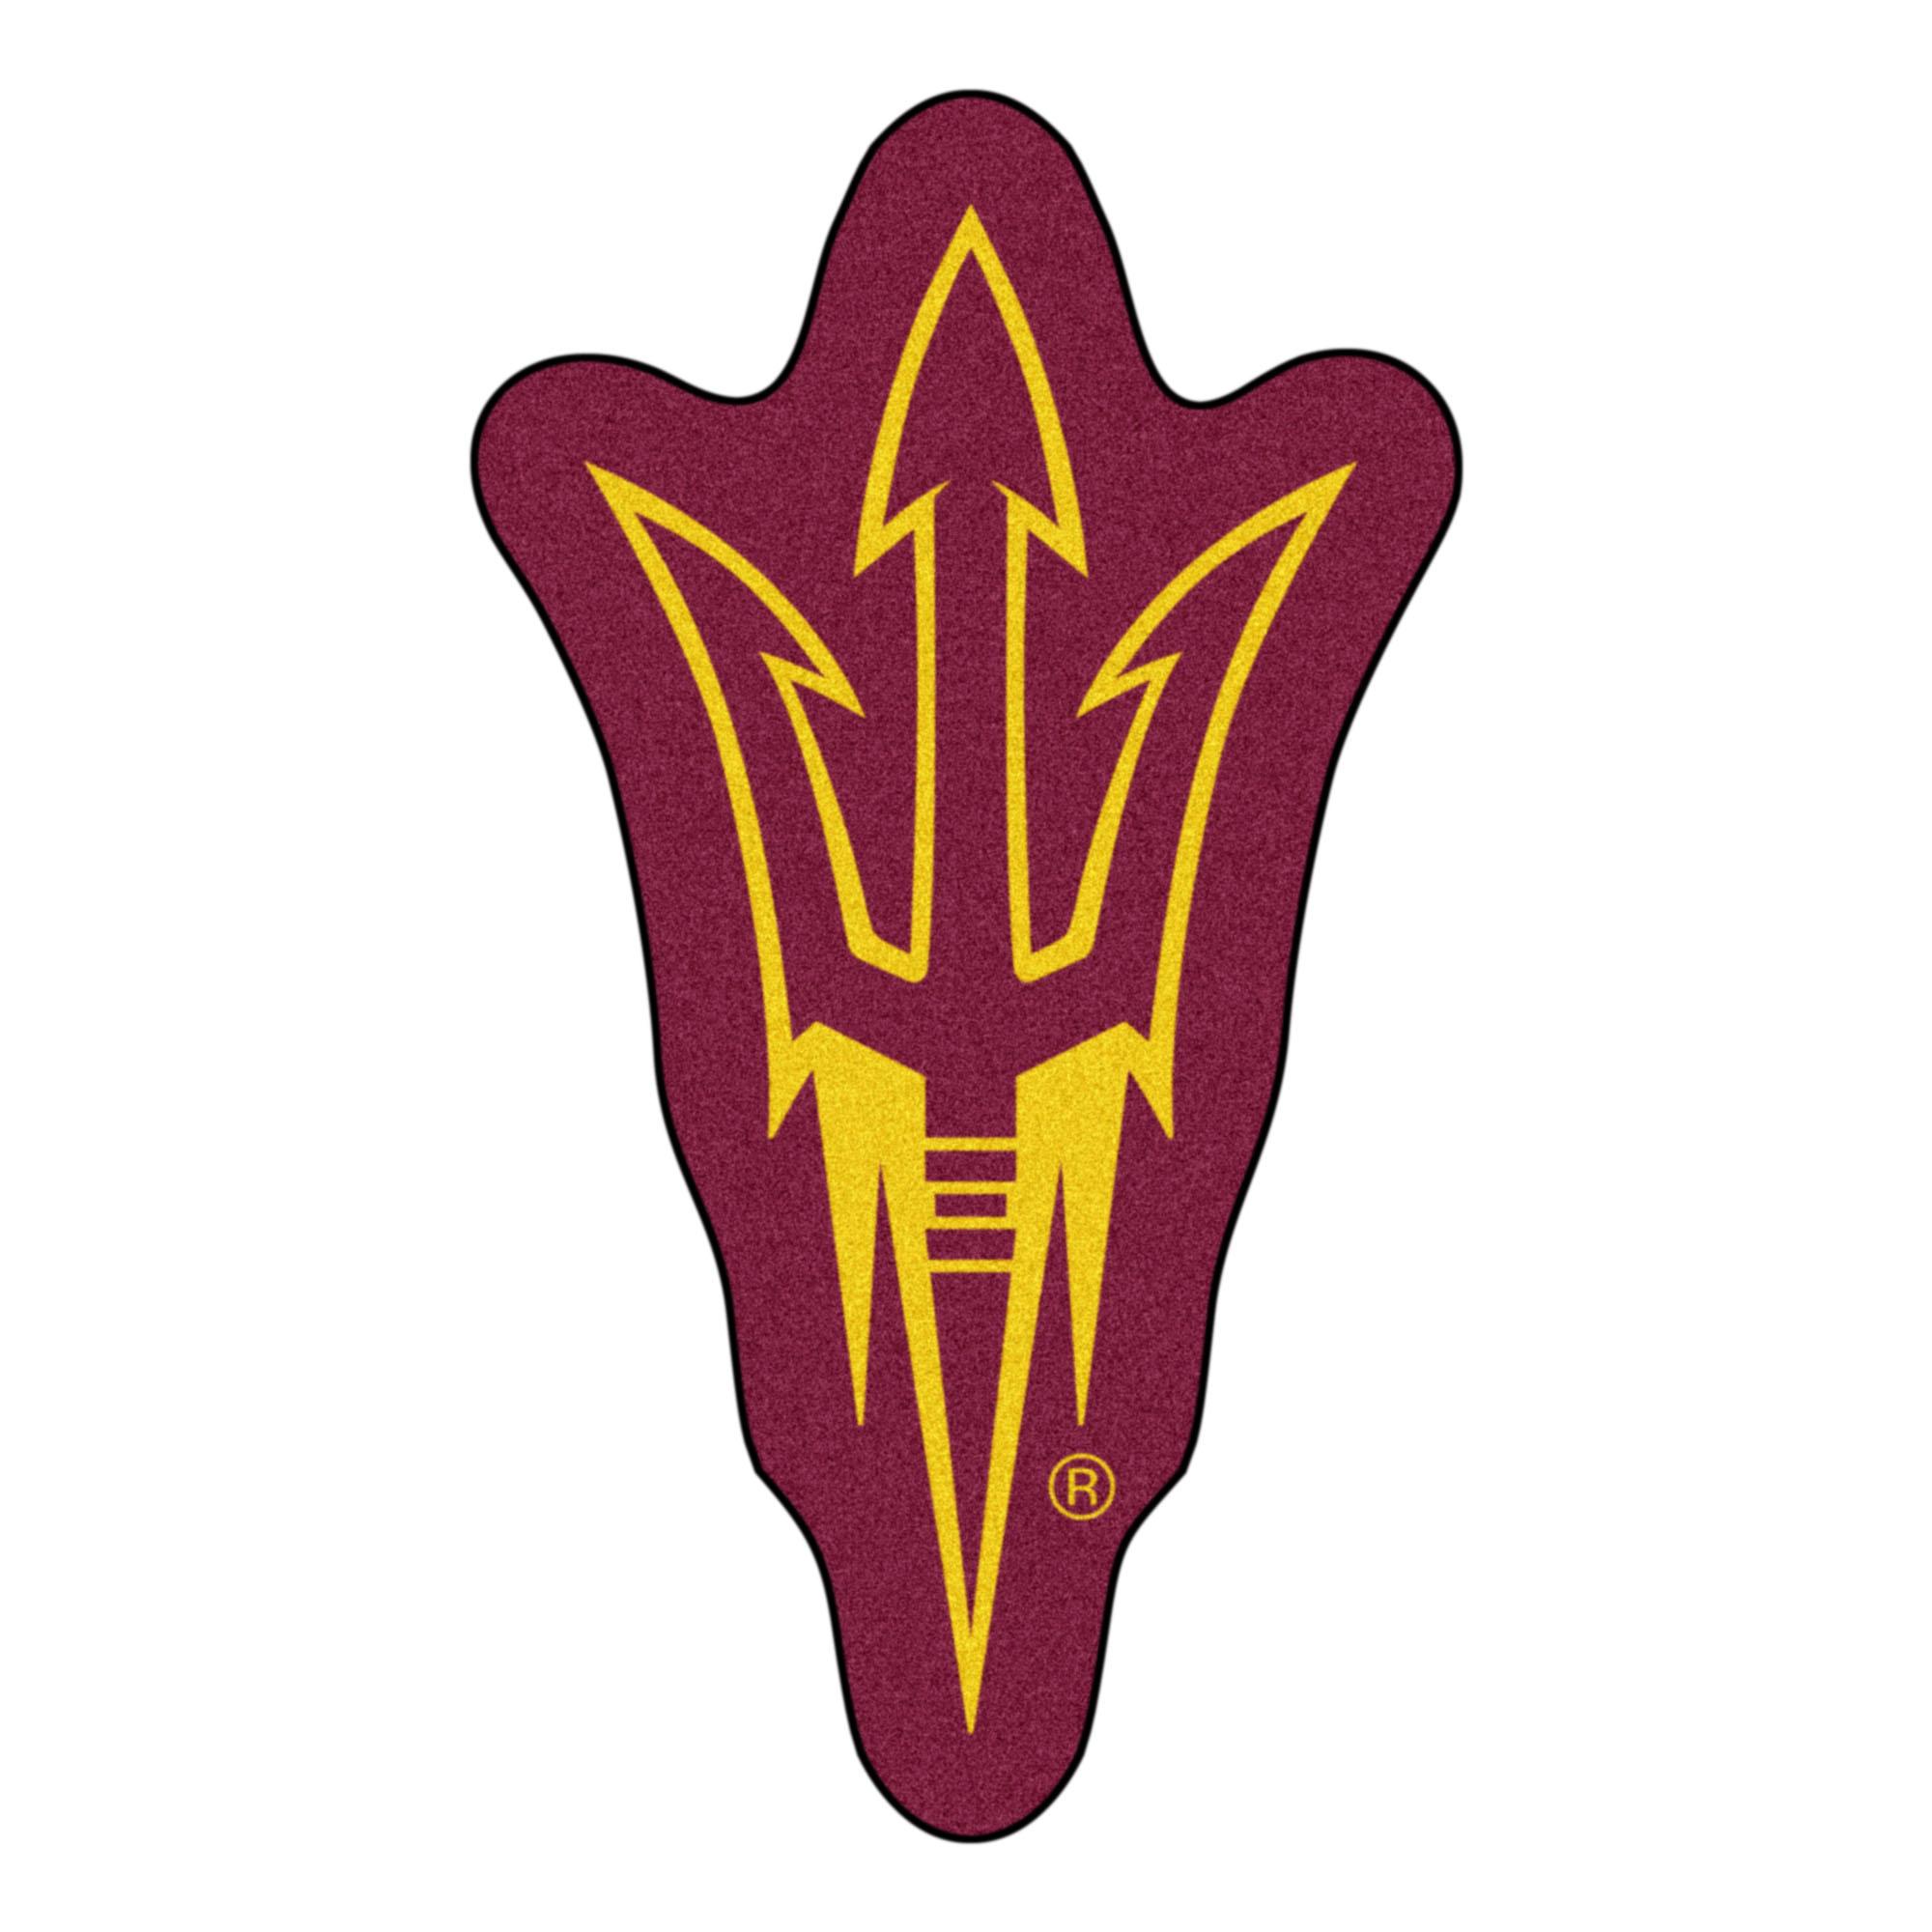 Arizona State Pitchfork Logo Mascot Area Rug.